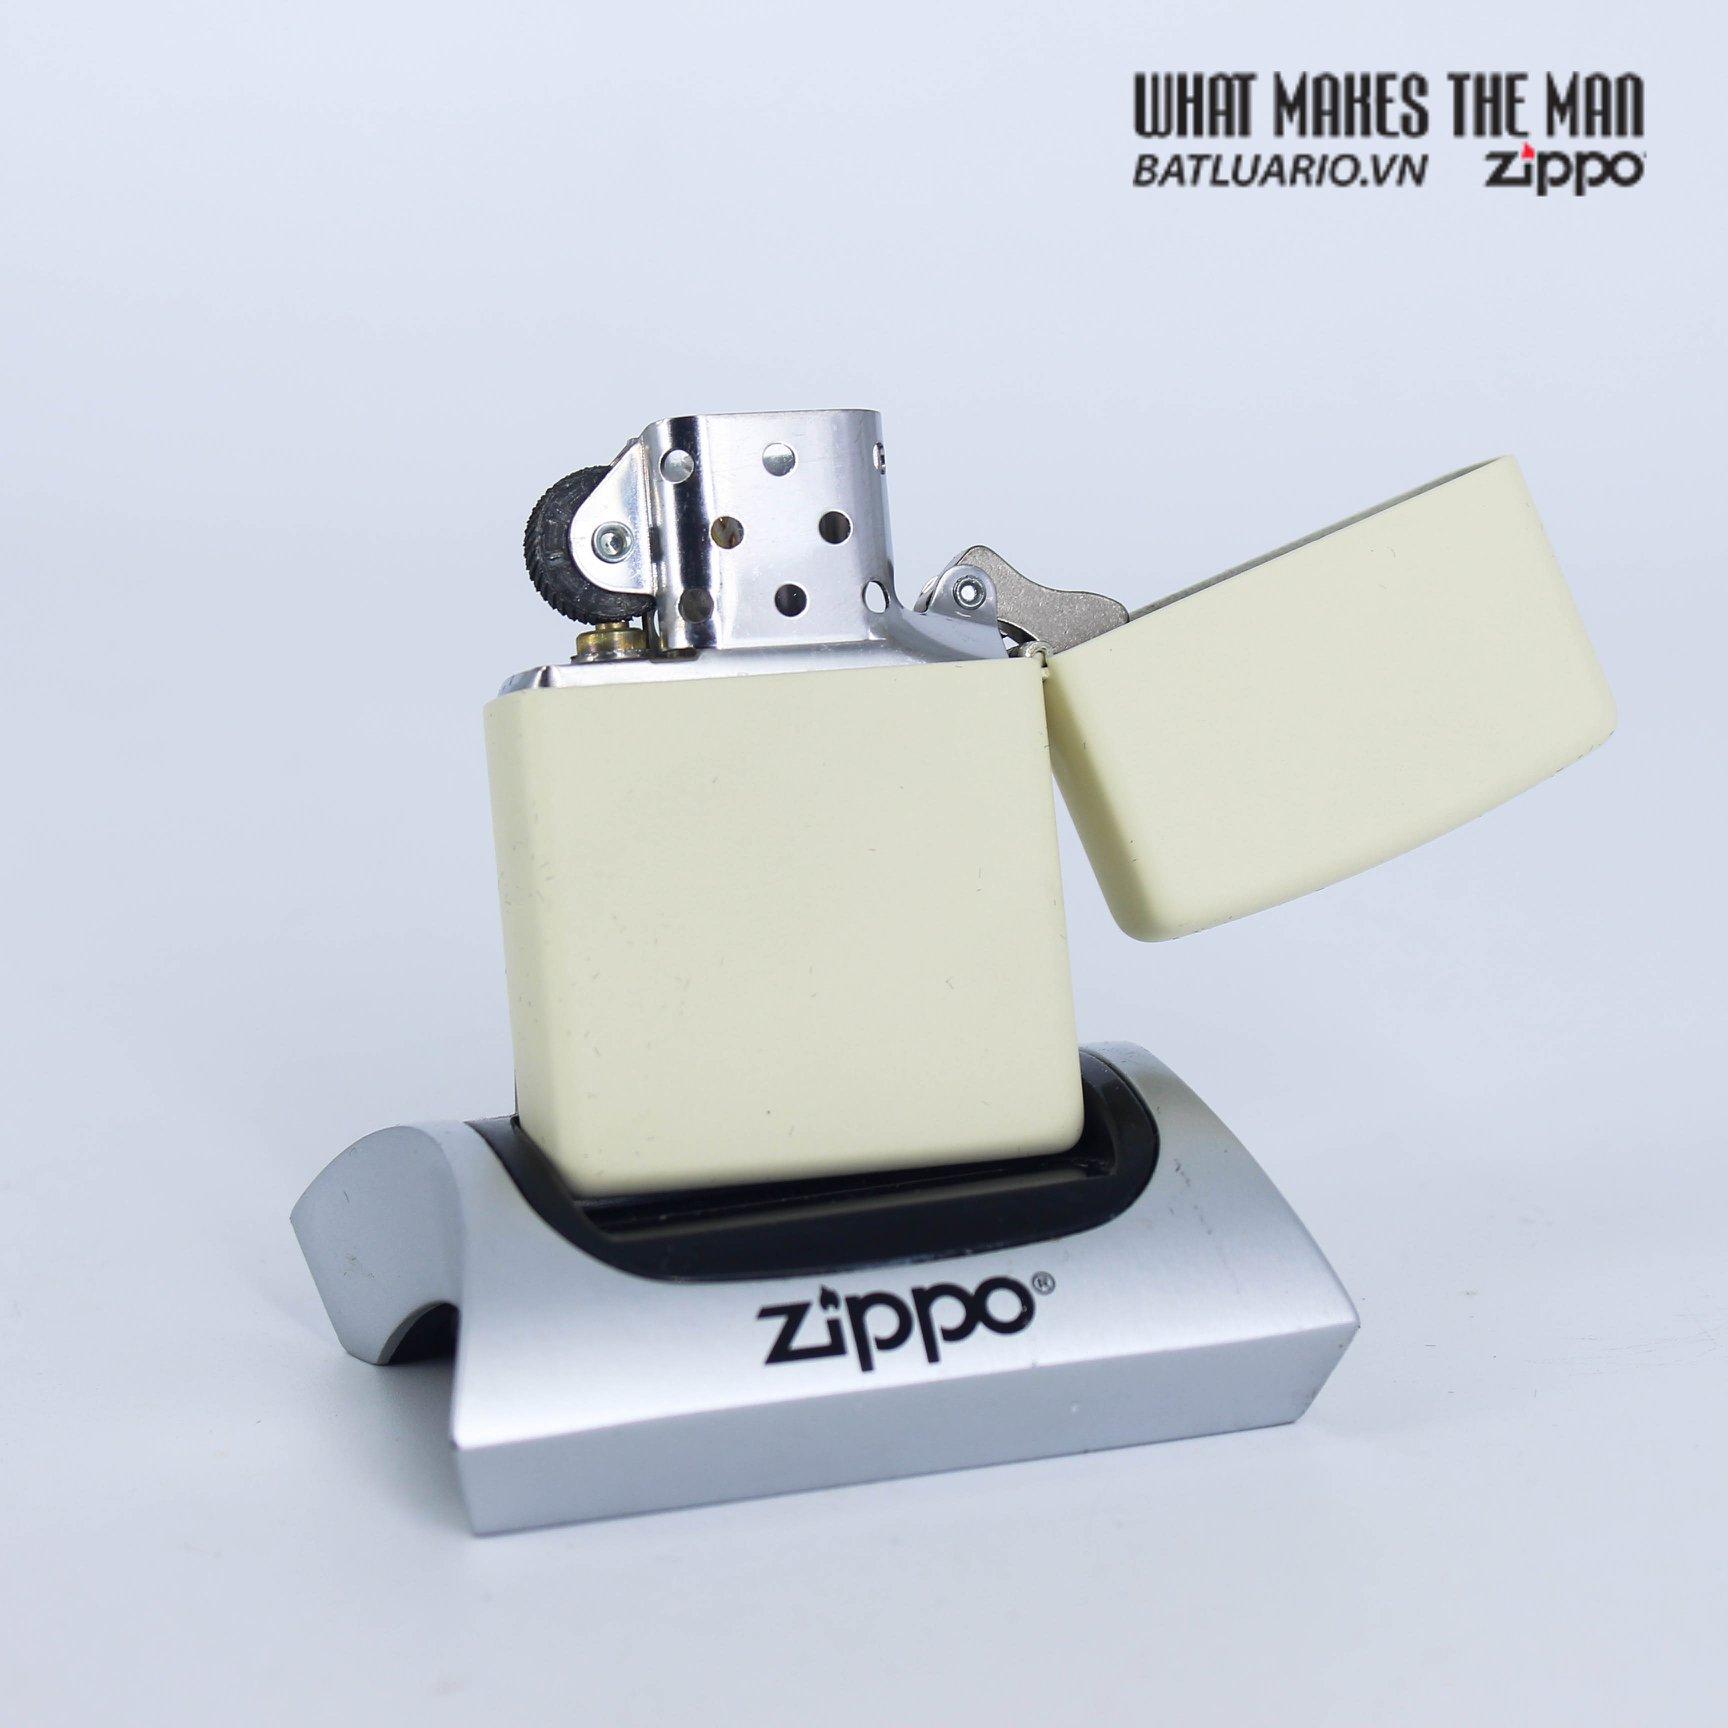 Zippo 29846 - Zippo Pagoda Bonsai Buddha Design 3